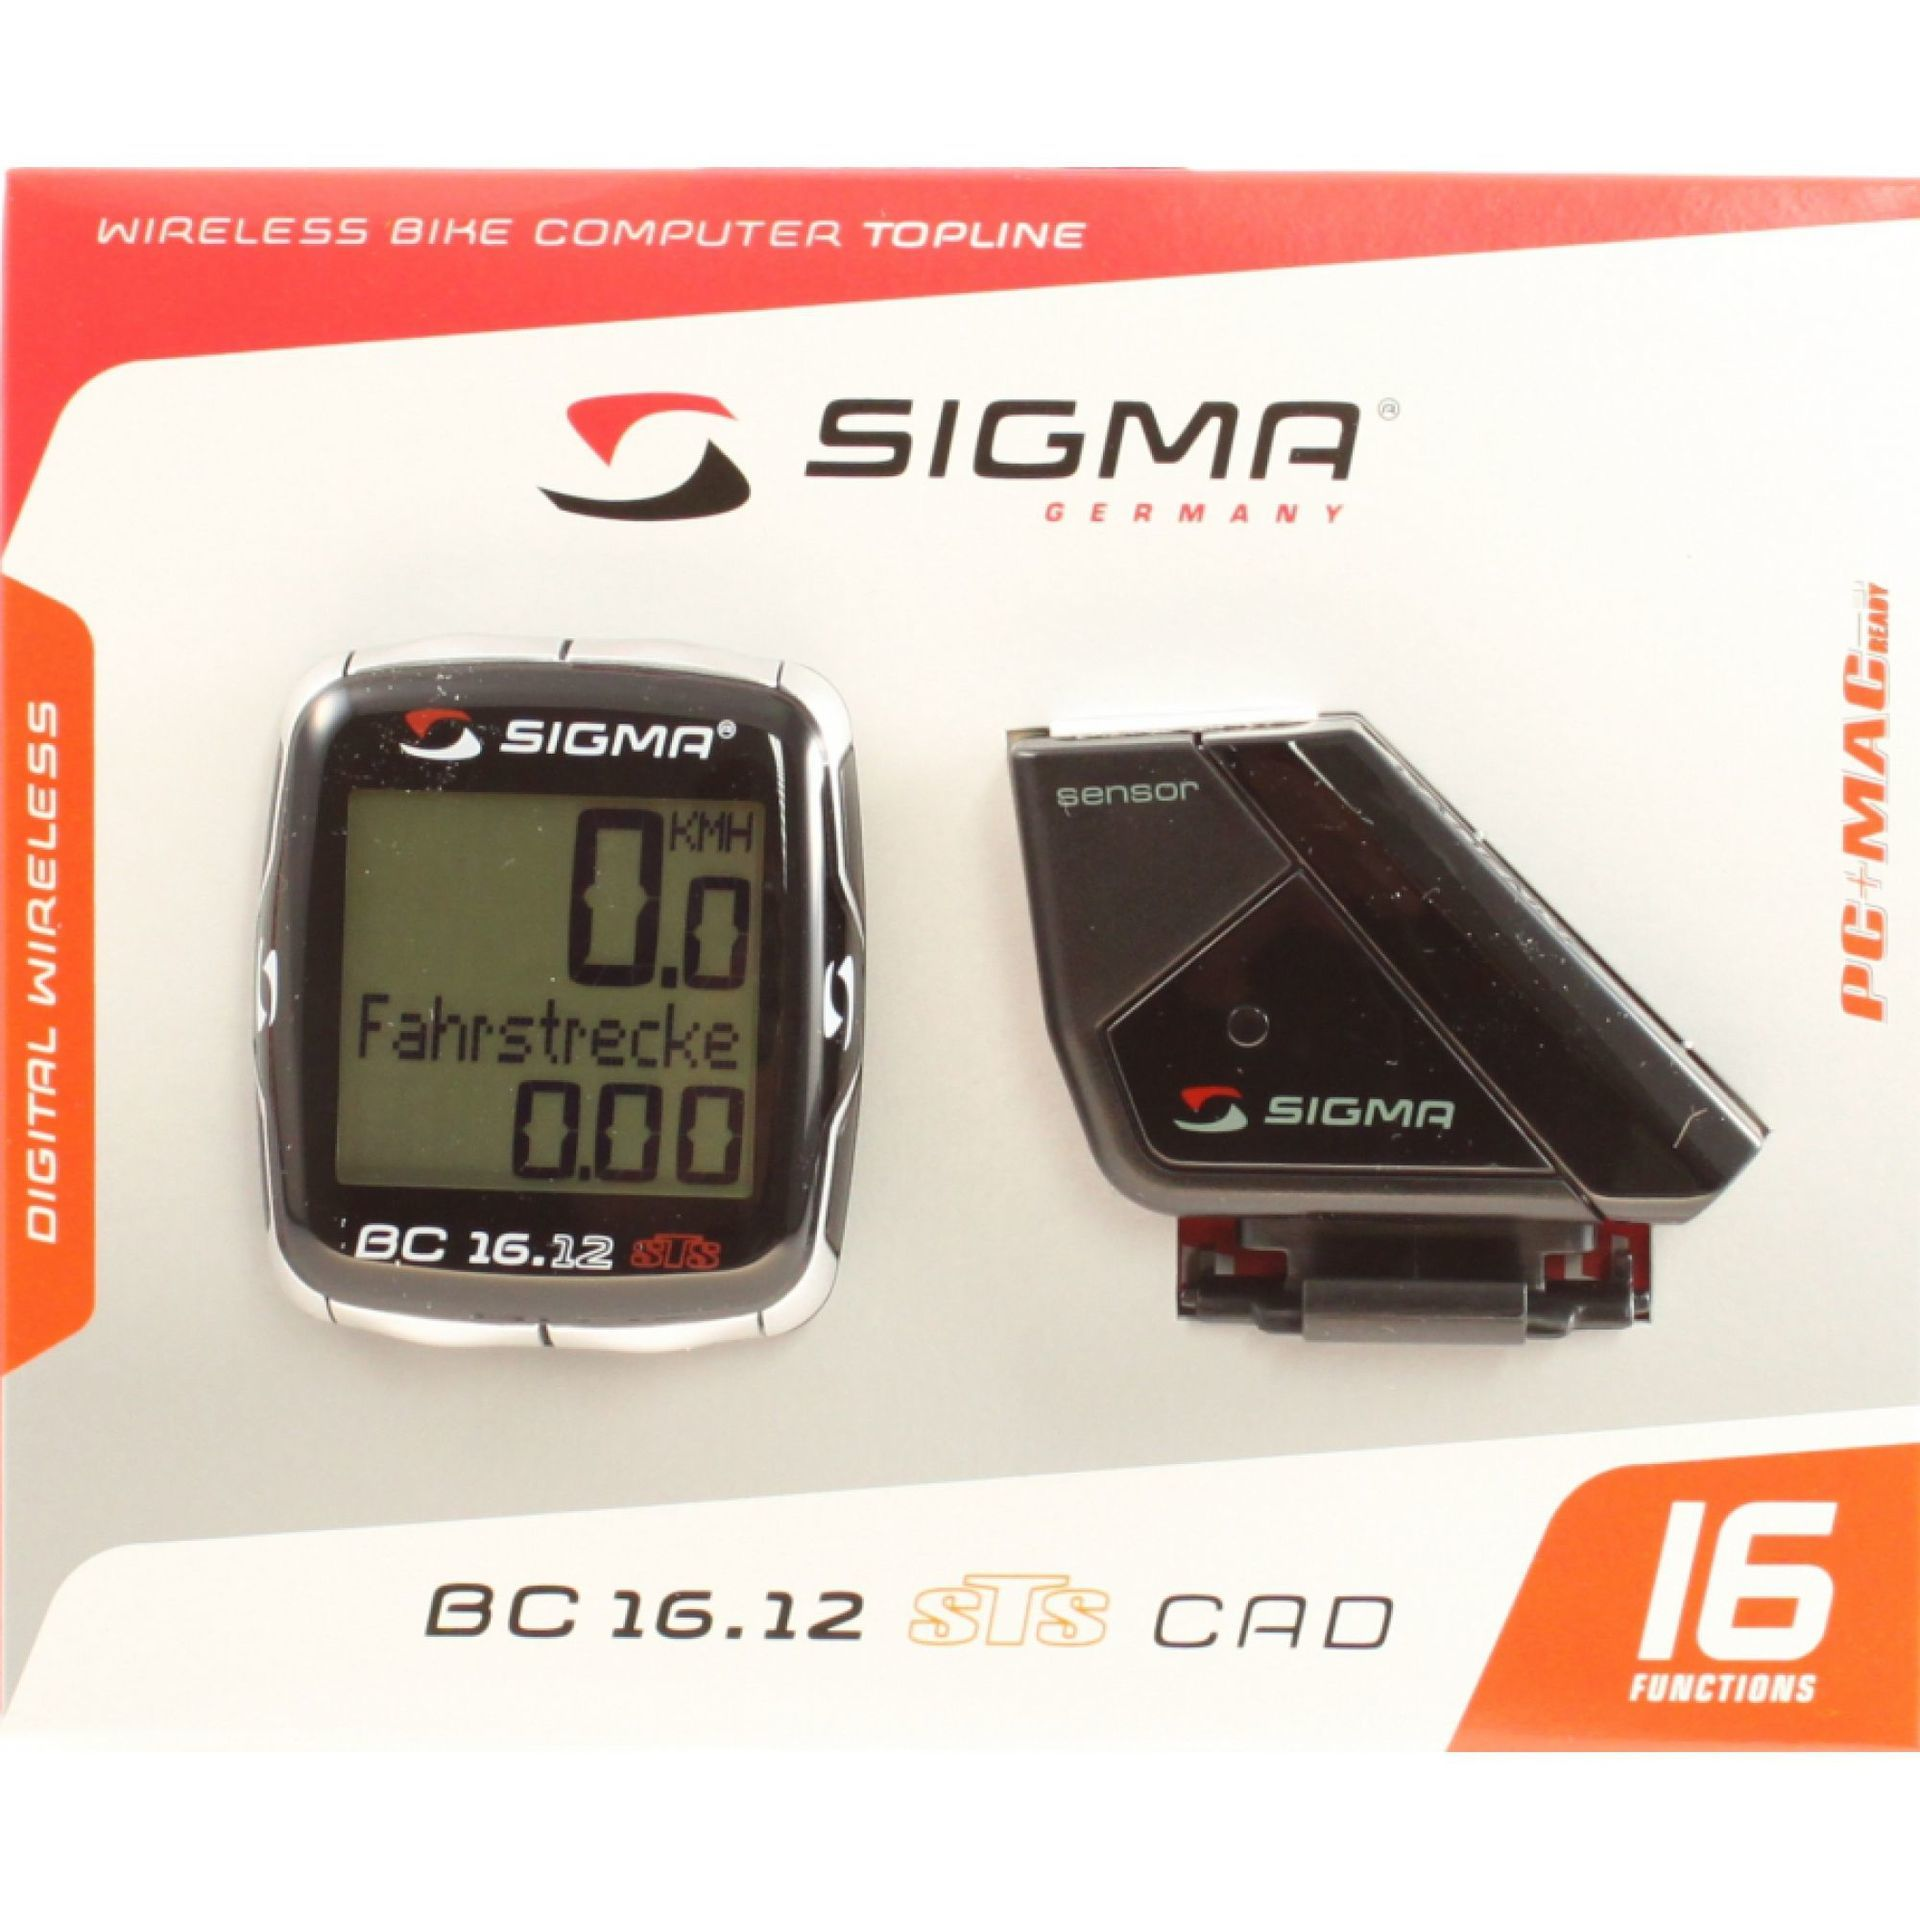 LICZNIK SIGMA BC 16.12 STS CAD